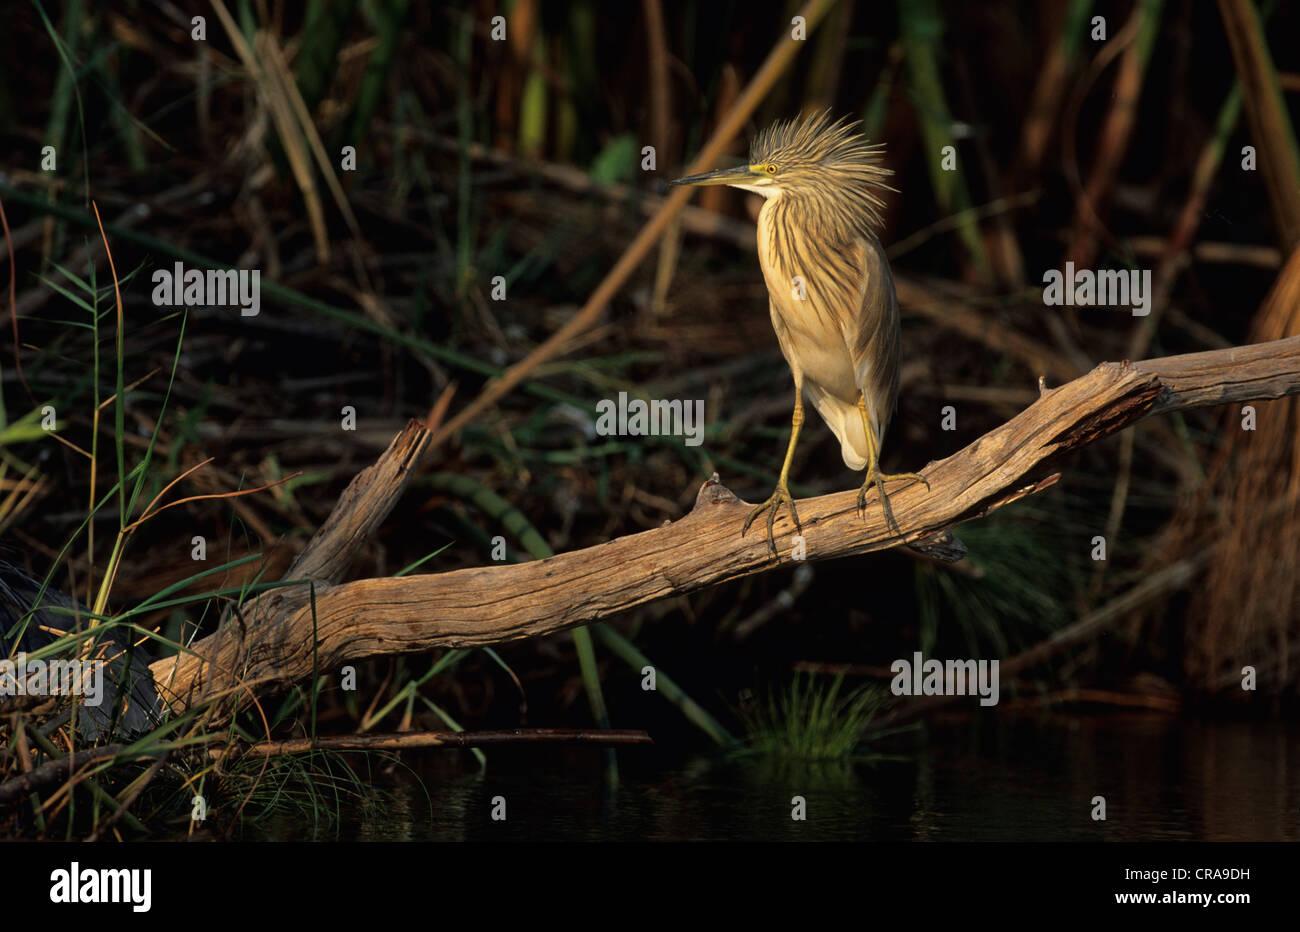 Crabier chevelu (ardeola ralloides), menace l'affichage, okavango delta, botswana, Africa Photo Stock